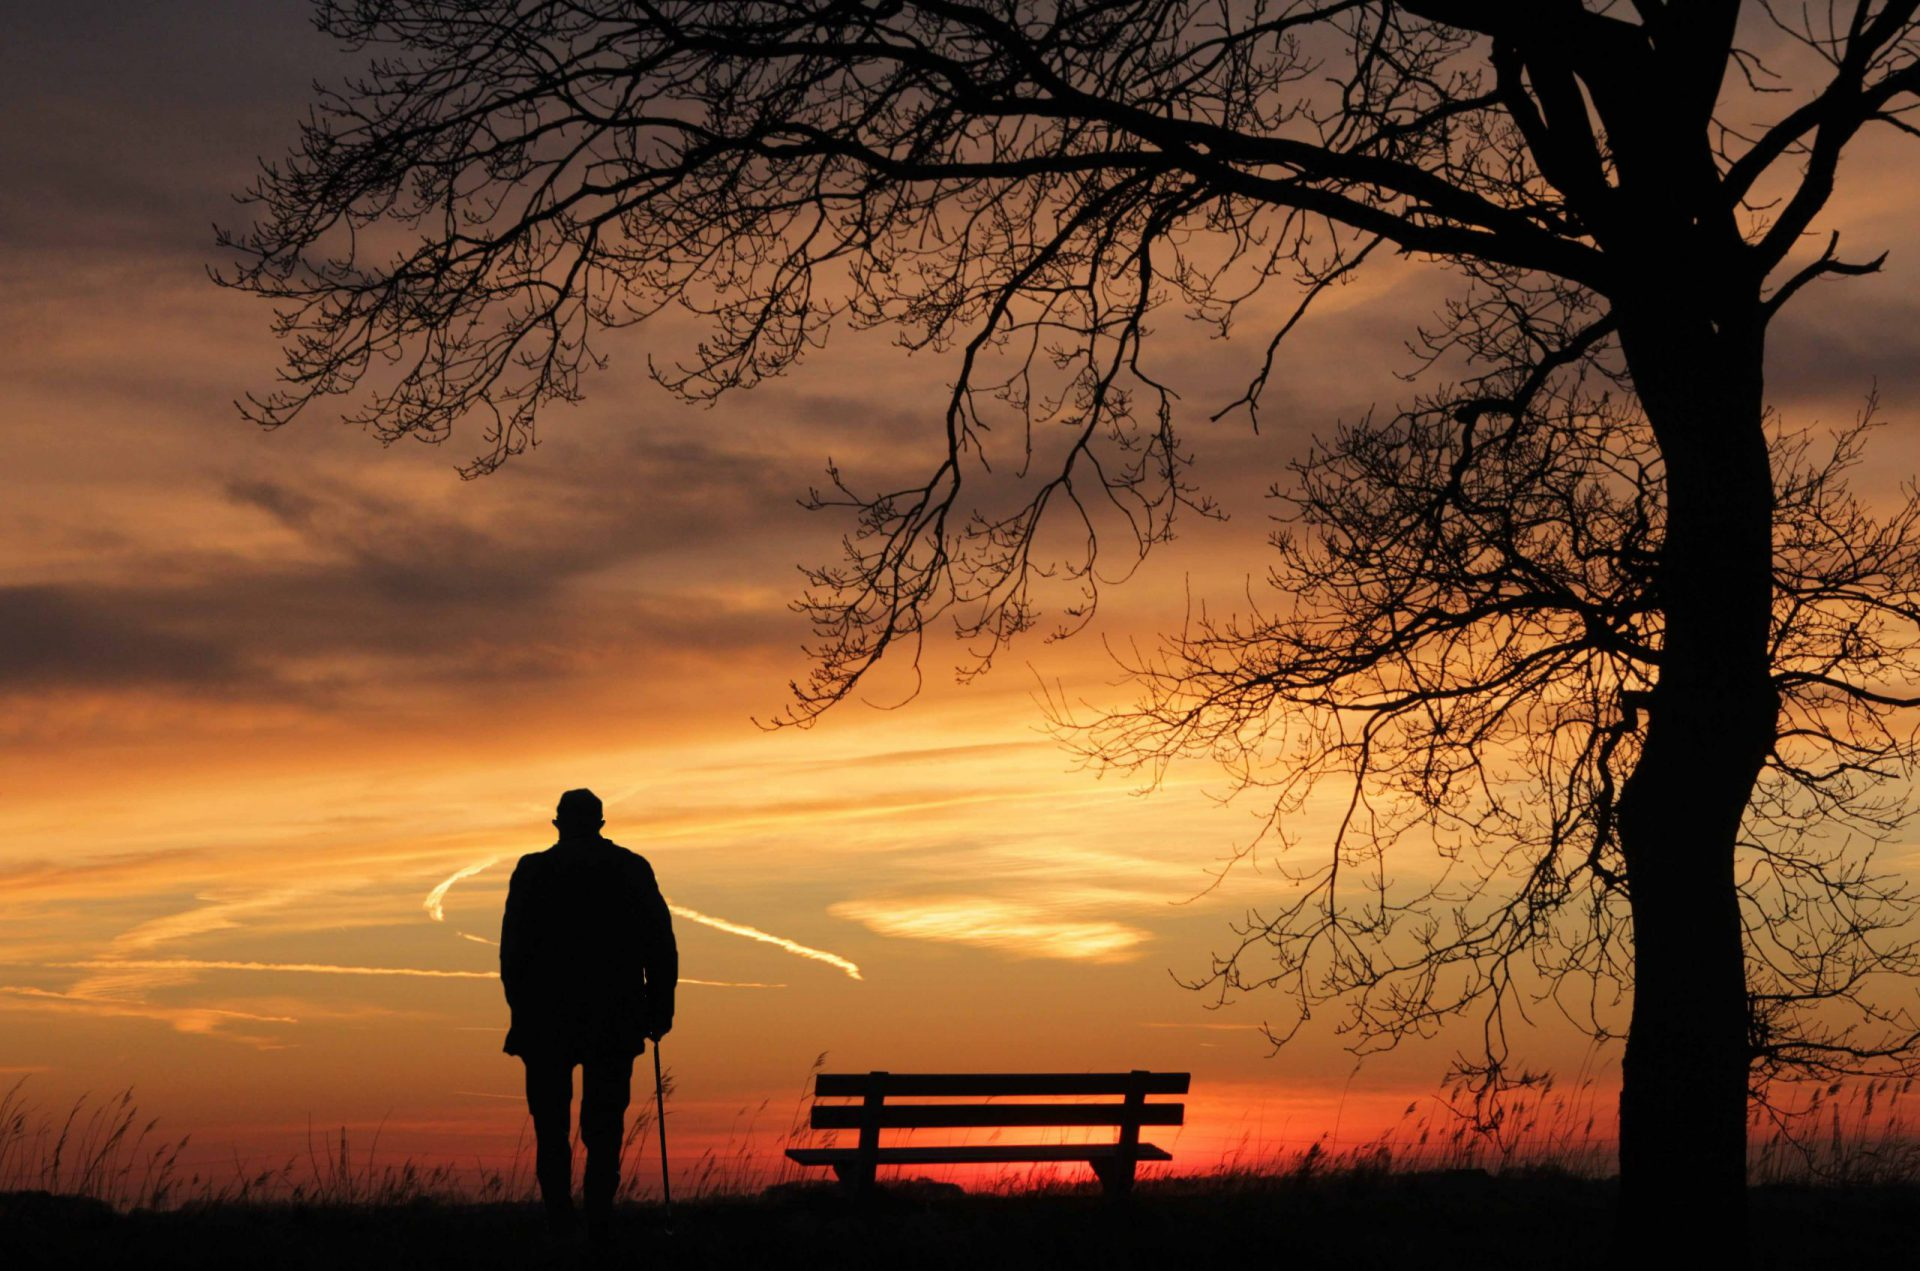 The elderly's need for hope